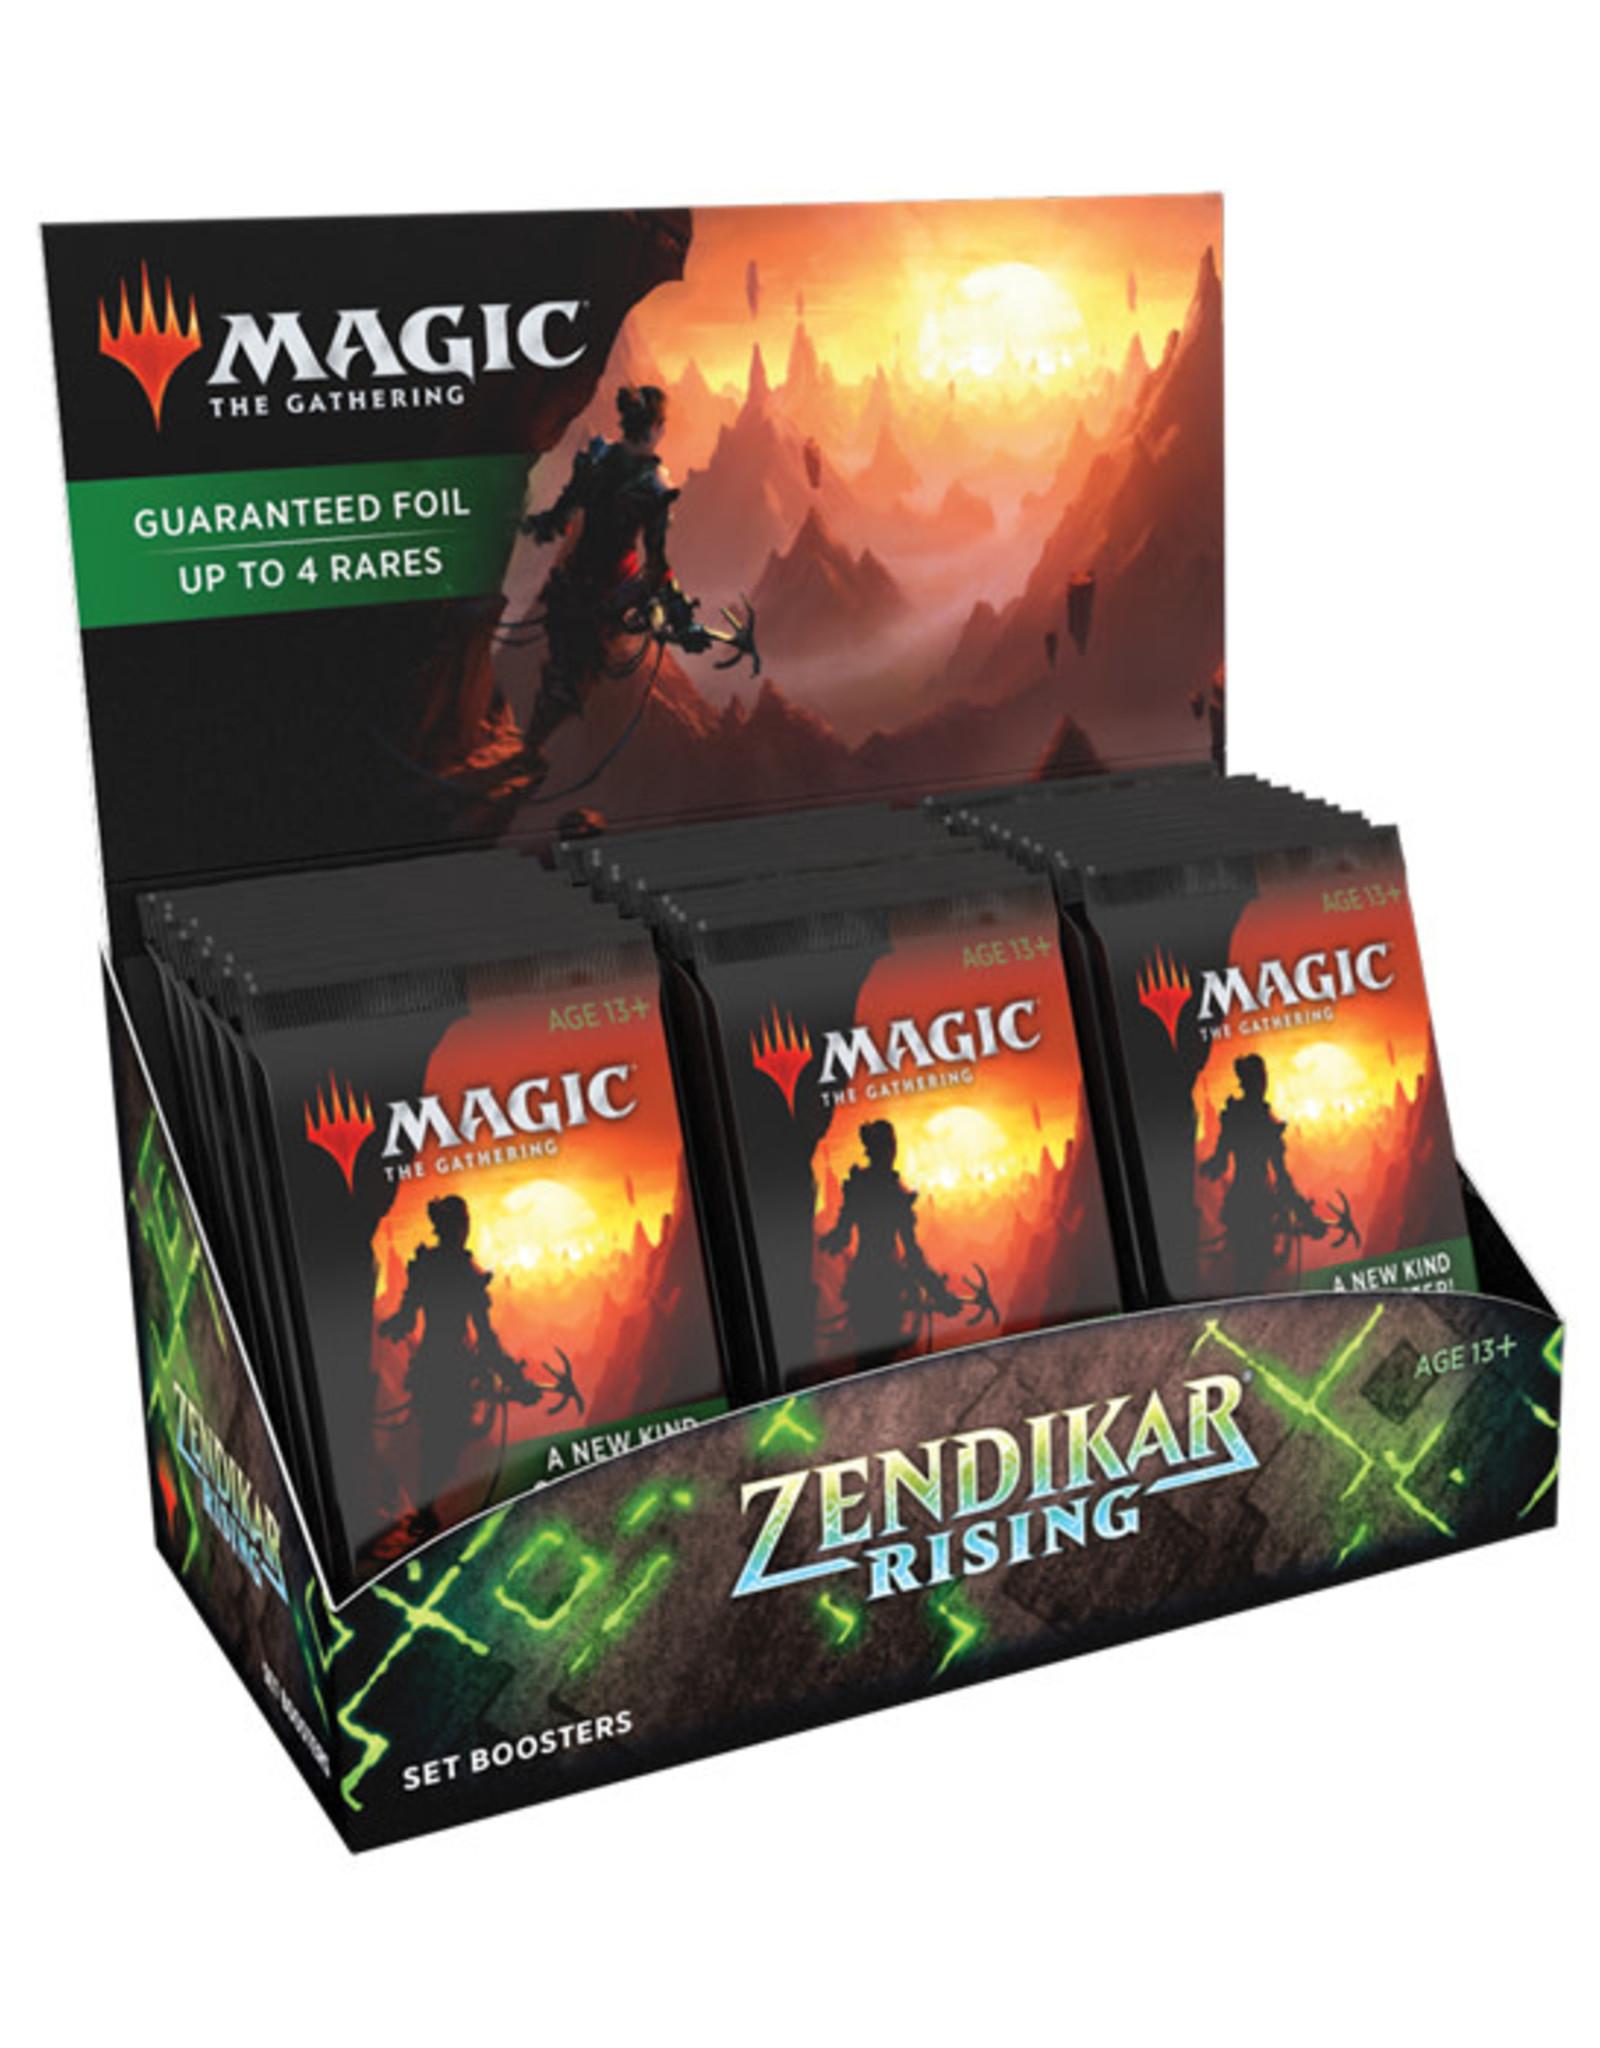 Magic: The Gathering Magic: The Gathering - Zendikar Rising - Set Booster Box